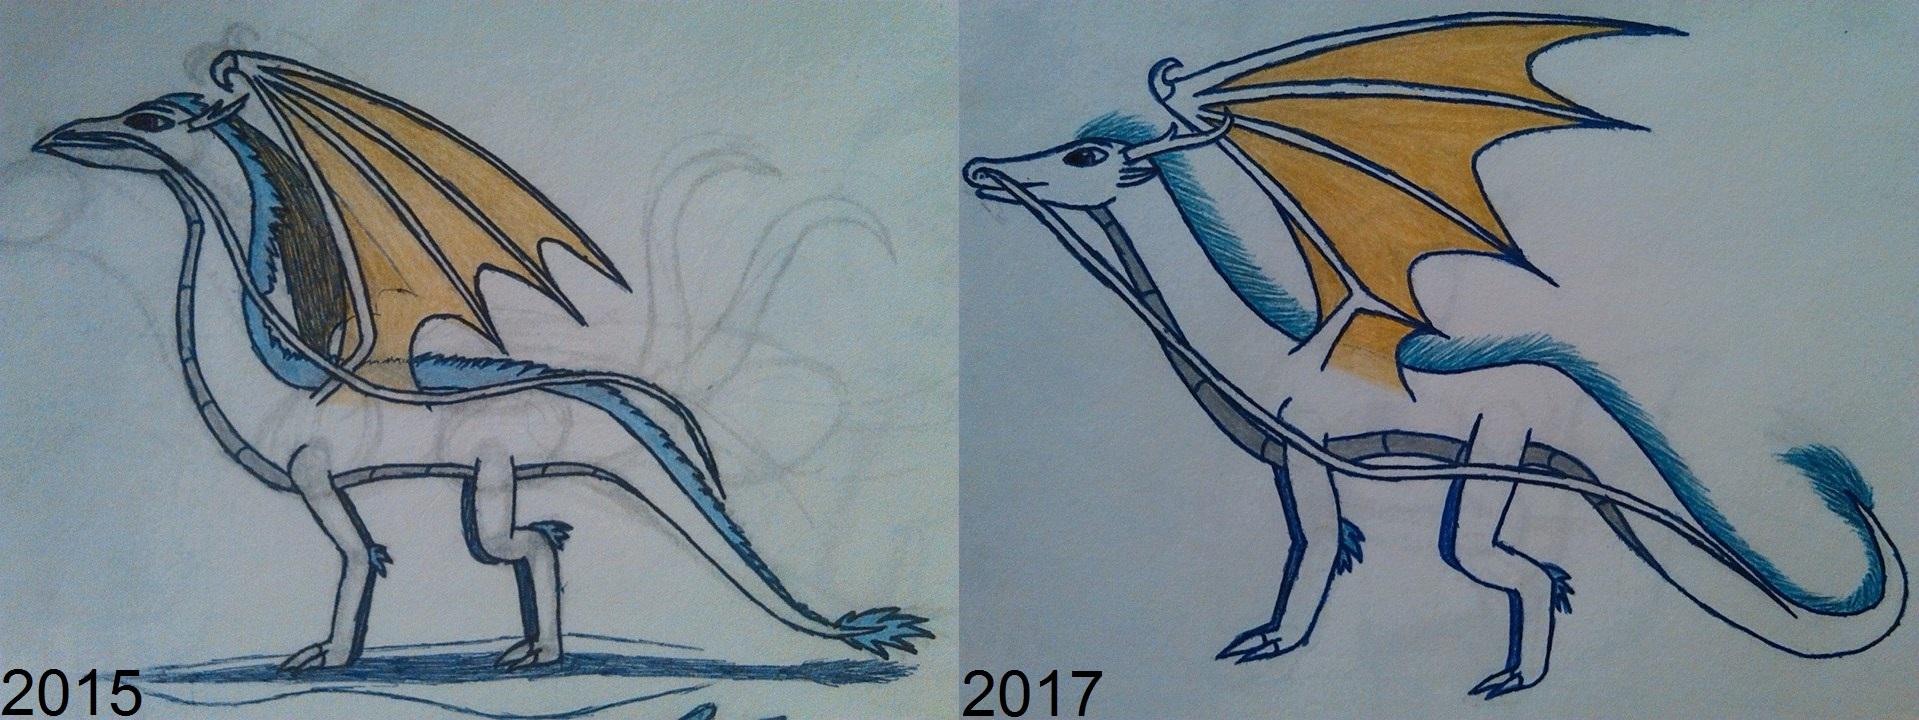 drawing_comparison__chragon_v2_by_dragon